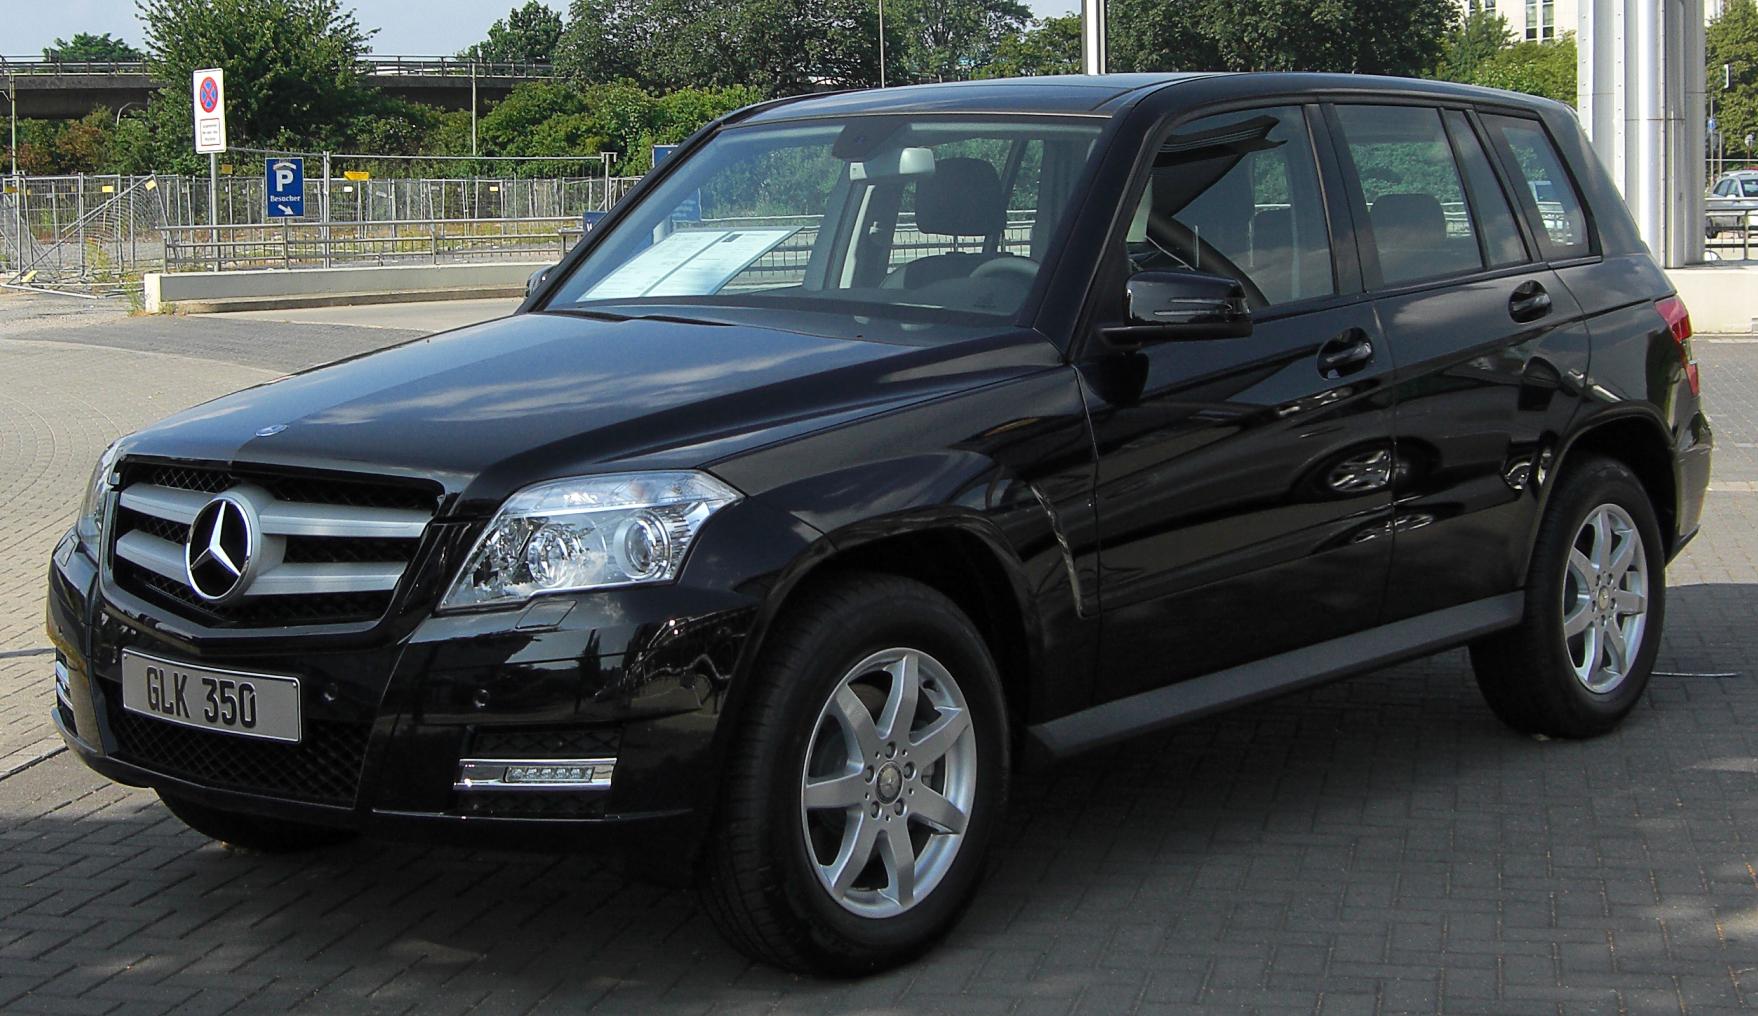 File:Mercedes GLK 350 CDI BlueEFFICIENCY (X204) front ...